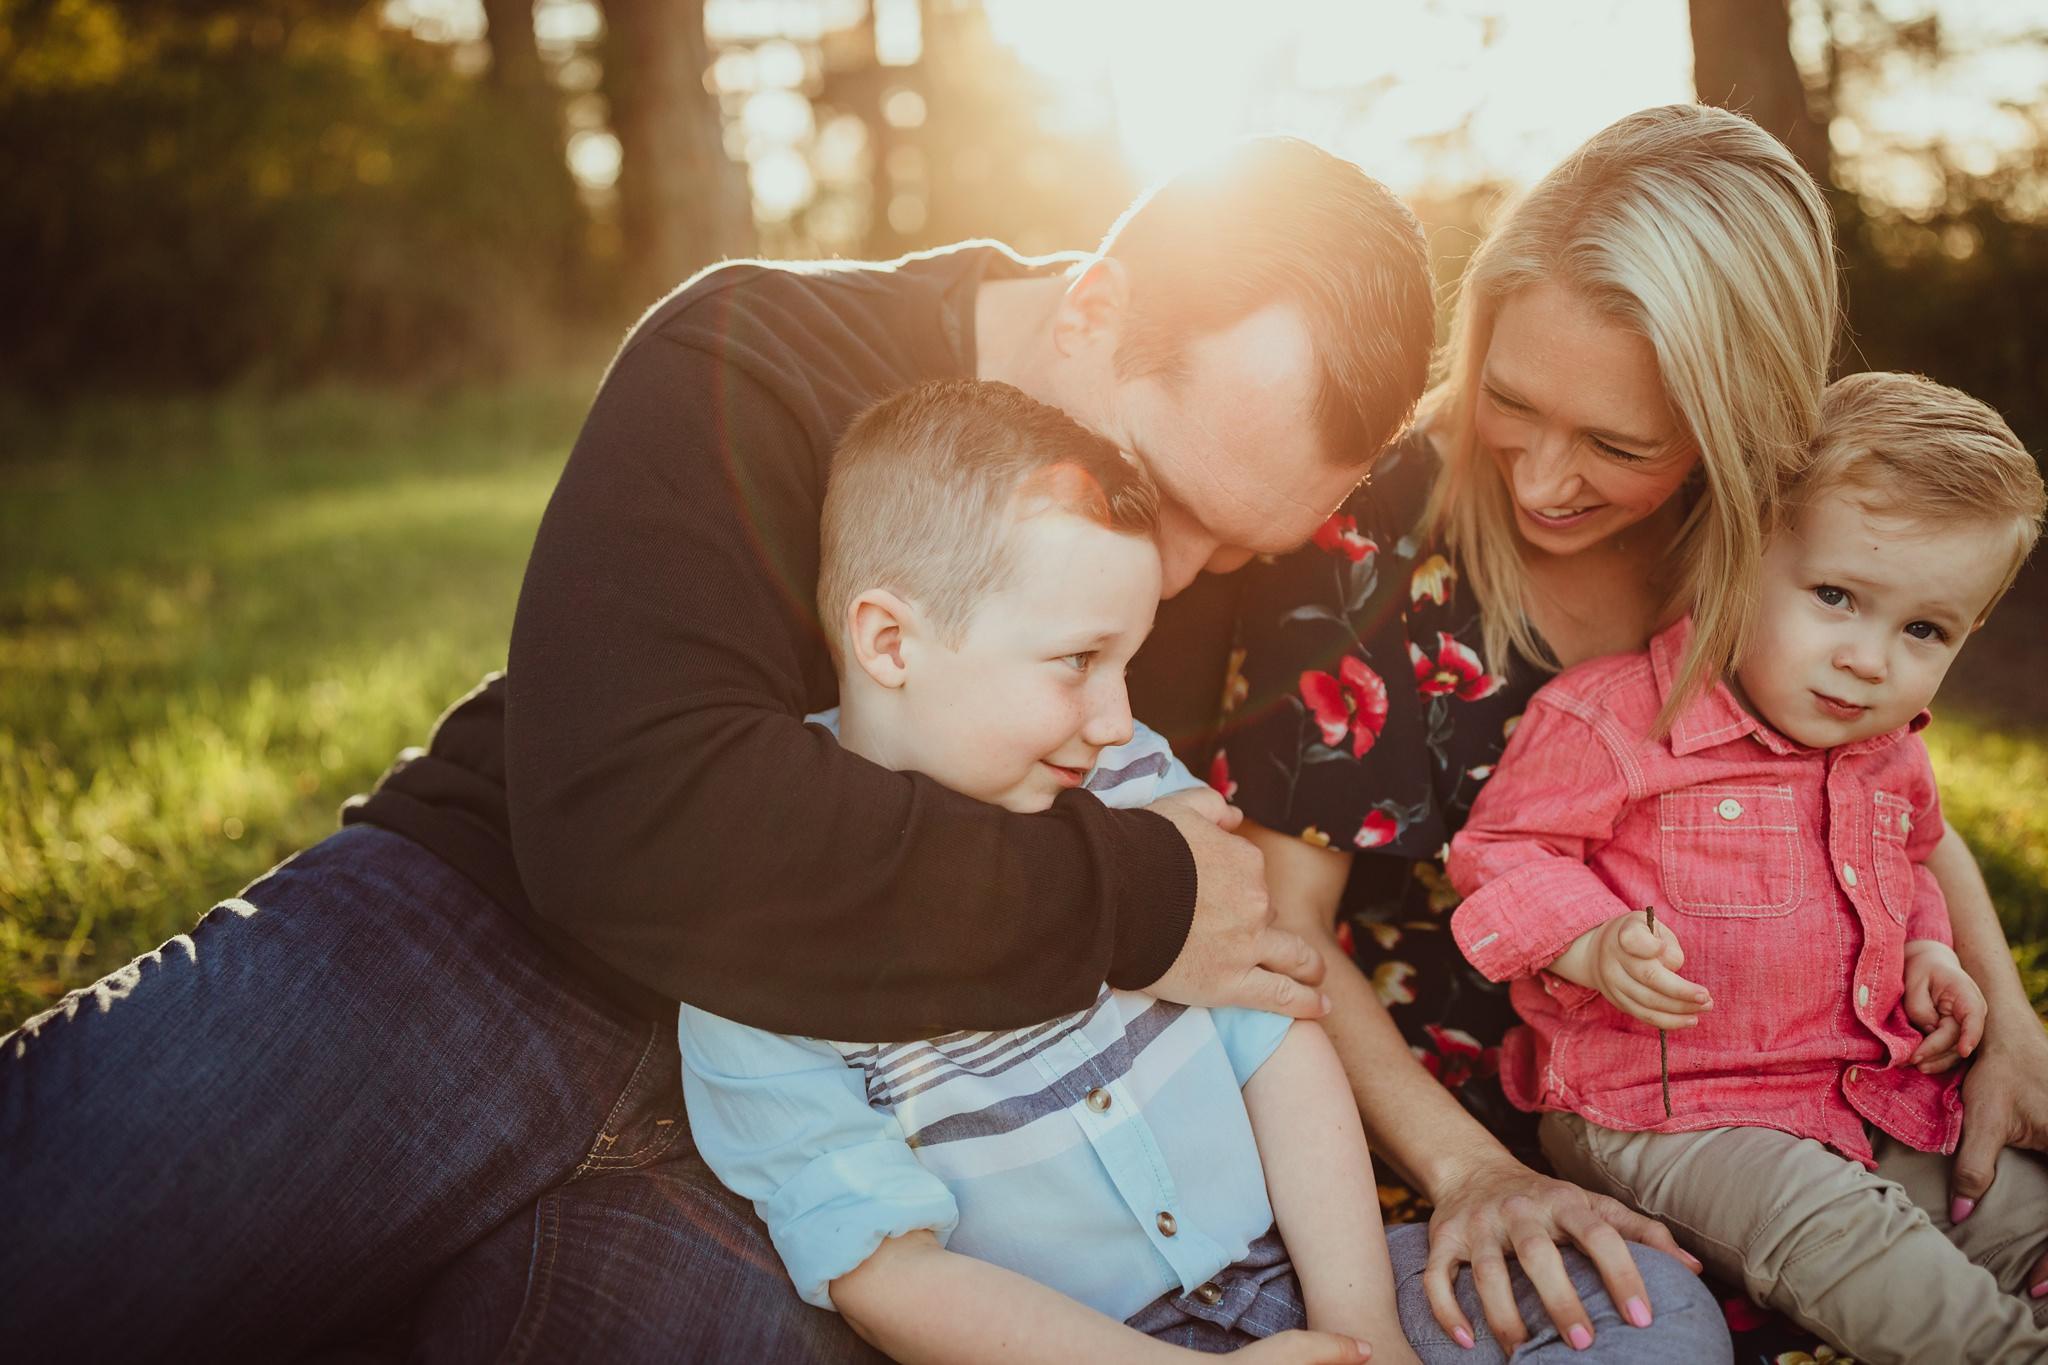 rosario-bay-churchill-family-session-kara-chappell-photography_0004.jpg